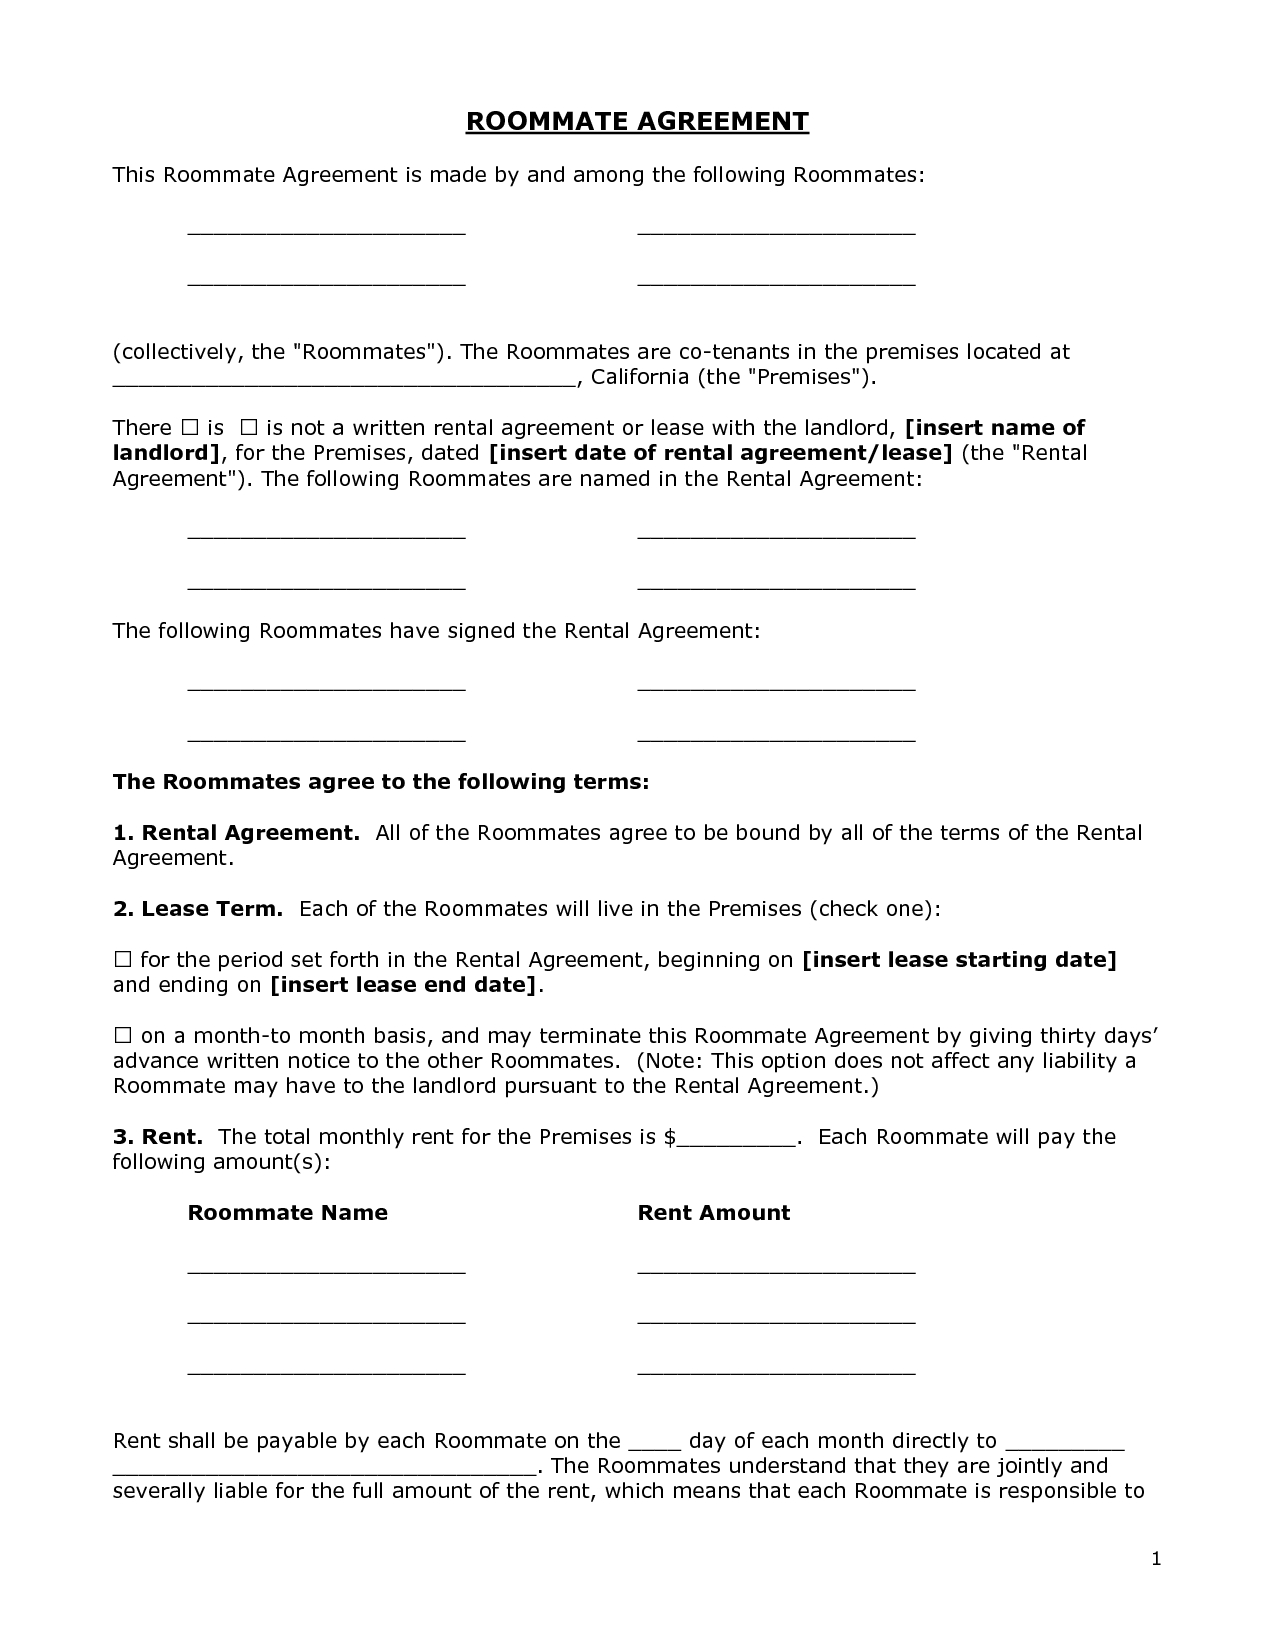 Renters Agreement Form - Docbgf31721 - Roommate Agreement - Free Printable Roommate Rental Agreement